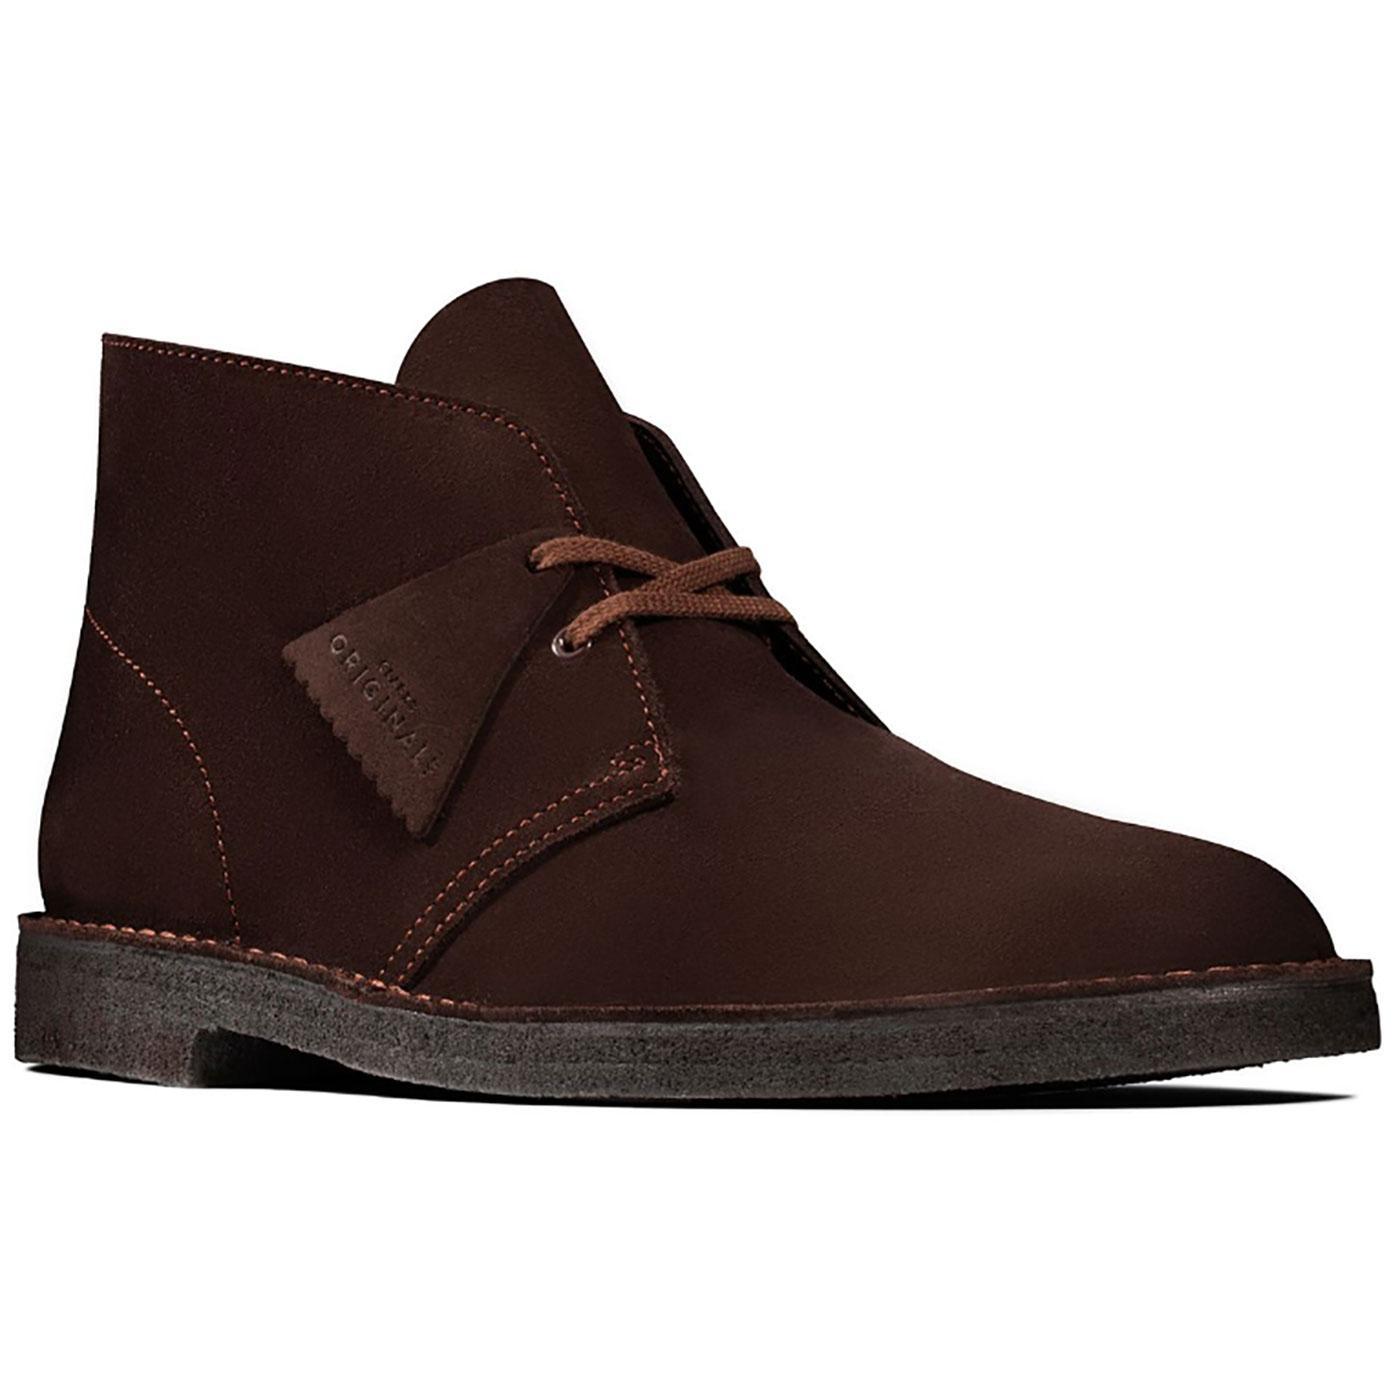 CLARKS ORIGINALS Mod Suede Desert Boots (Brown)